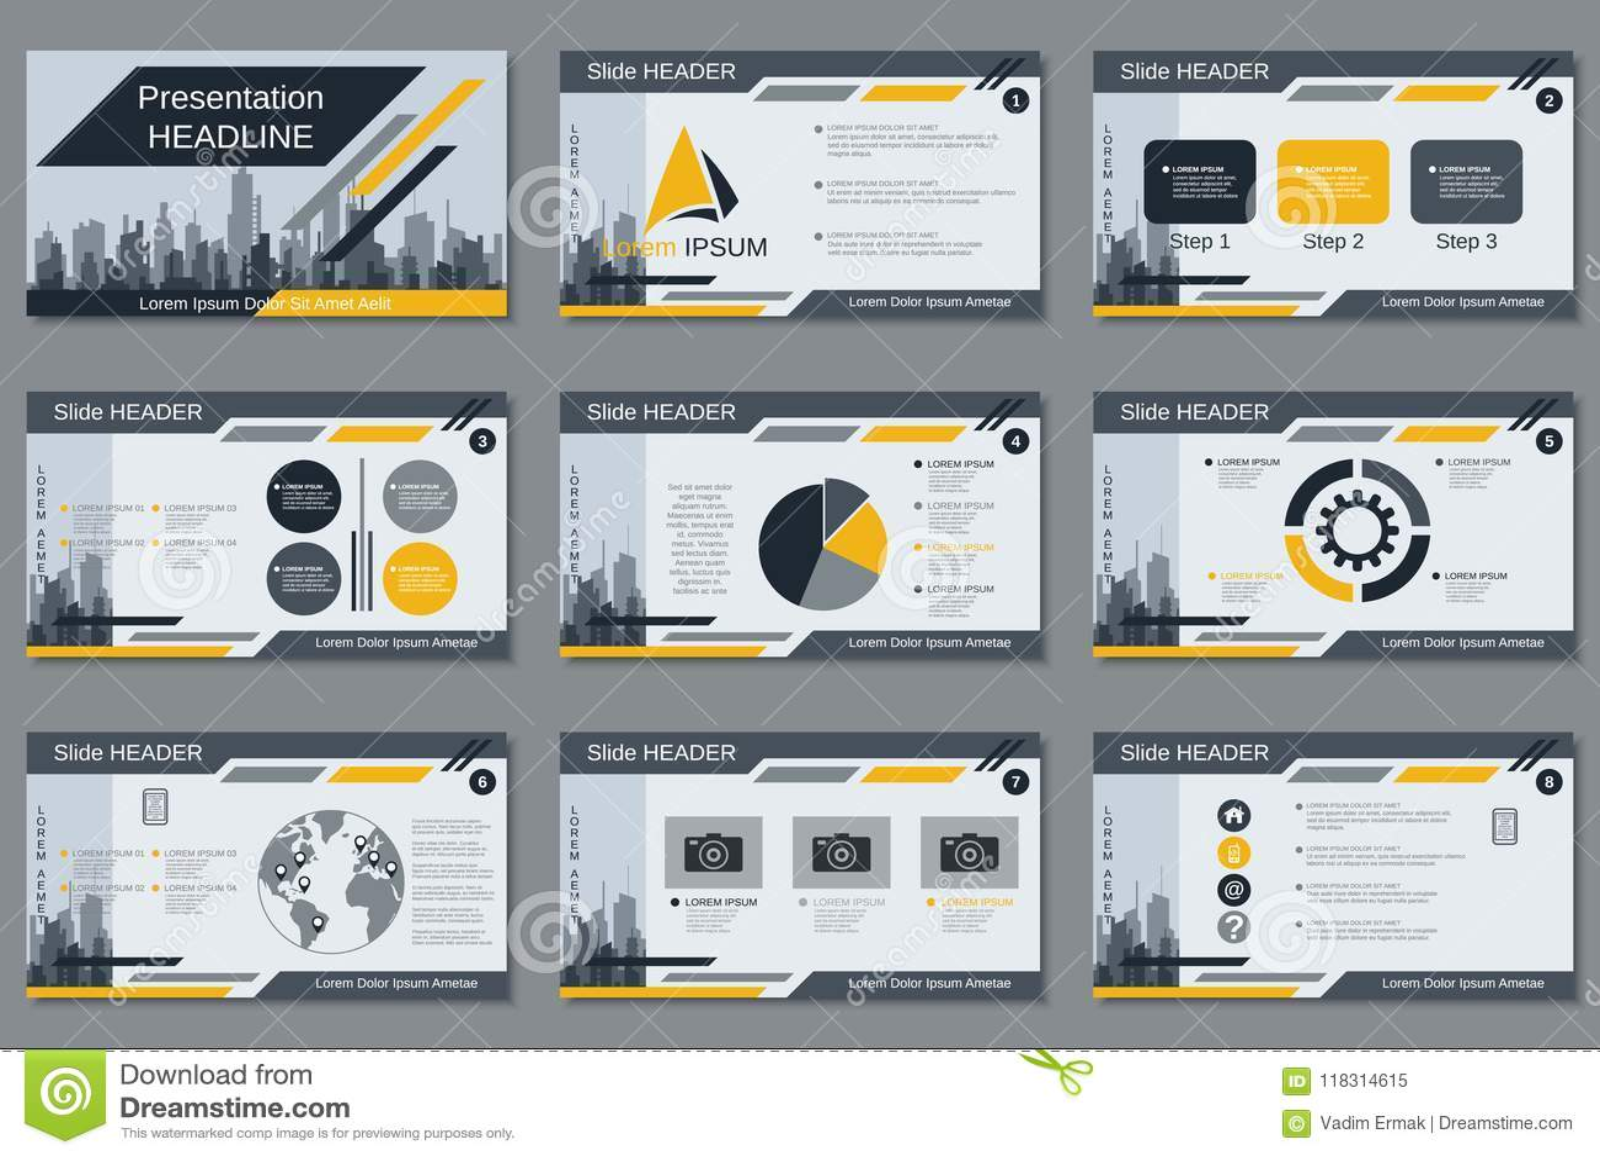 Professional business presentation slide show vector template stock professional business presentation slide show vector template accmission Choice Image